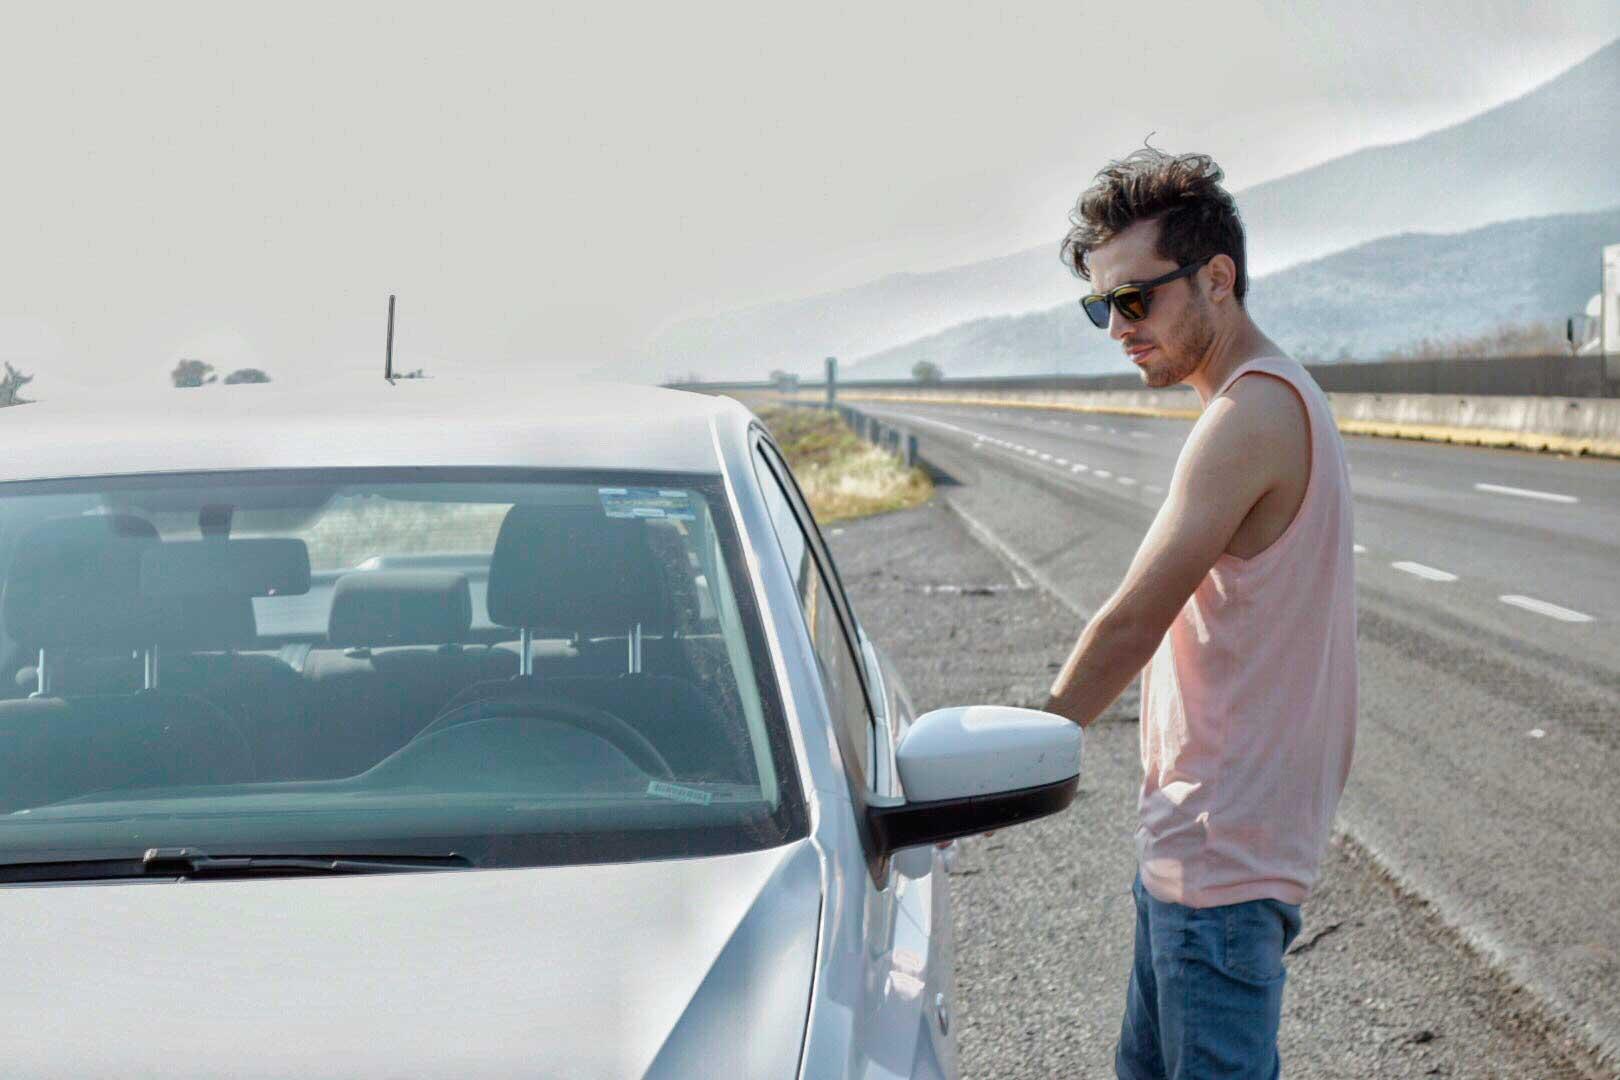 veico-car-rental-alexjumper-3